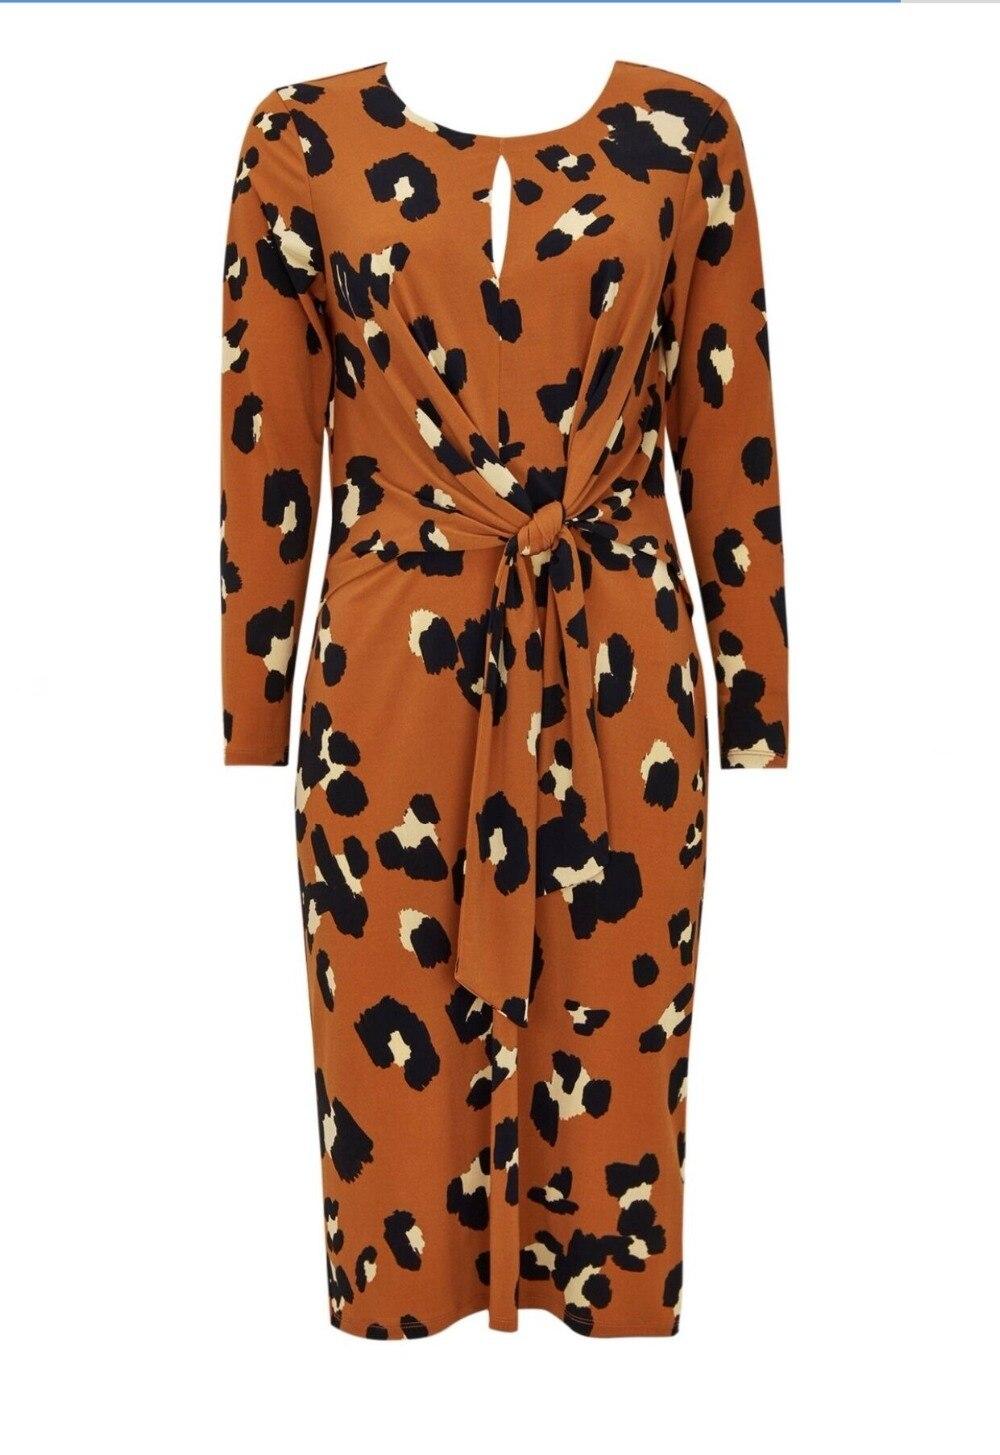 Women Leopard Print Mid Calf Length Dress Puttee Sashes Long Sleeve